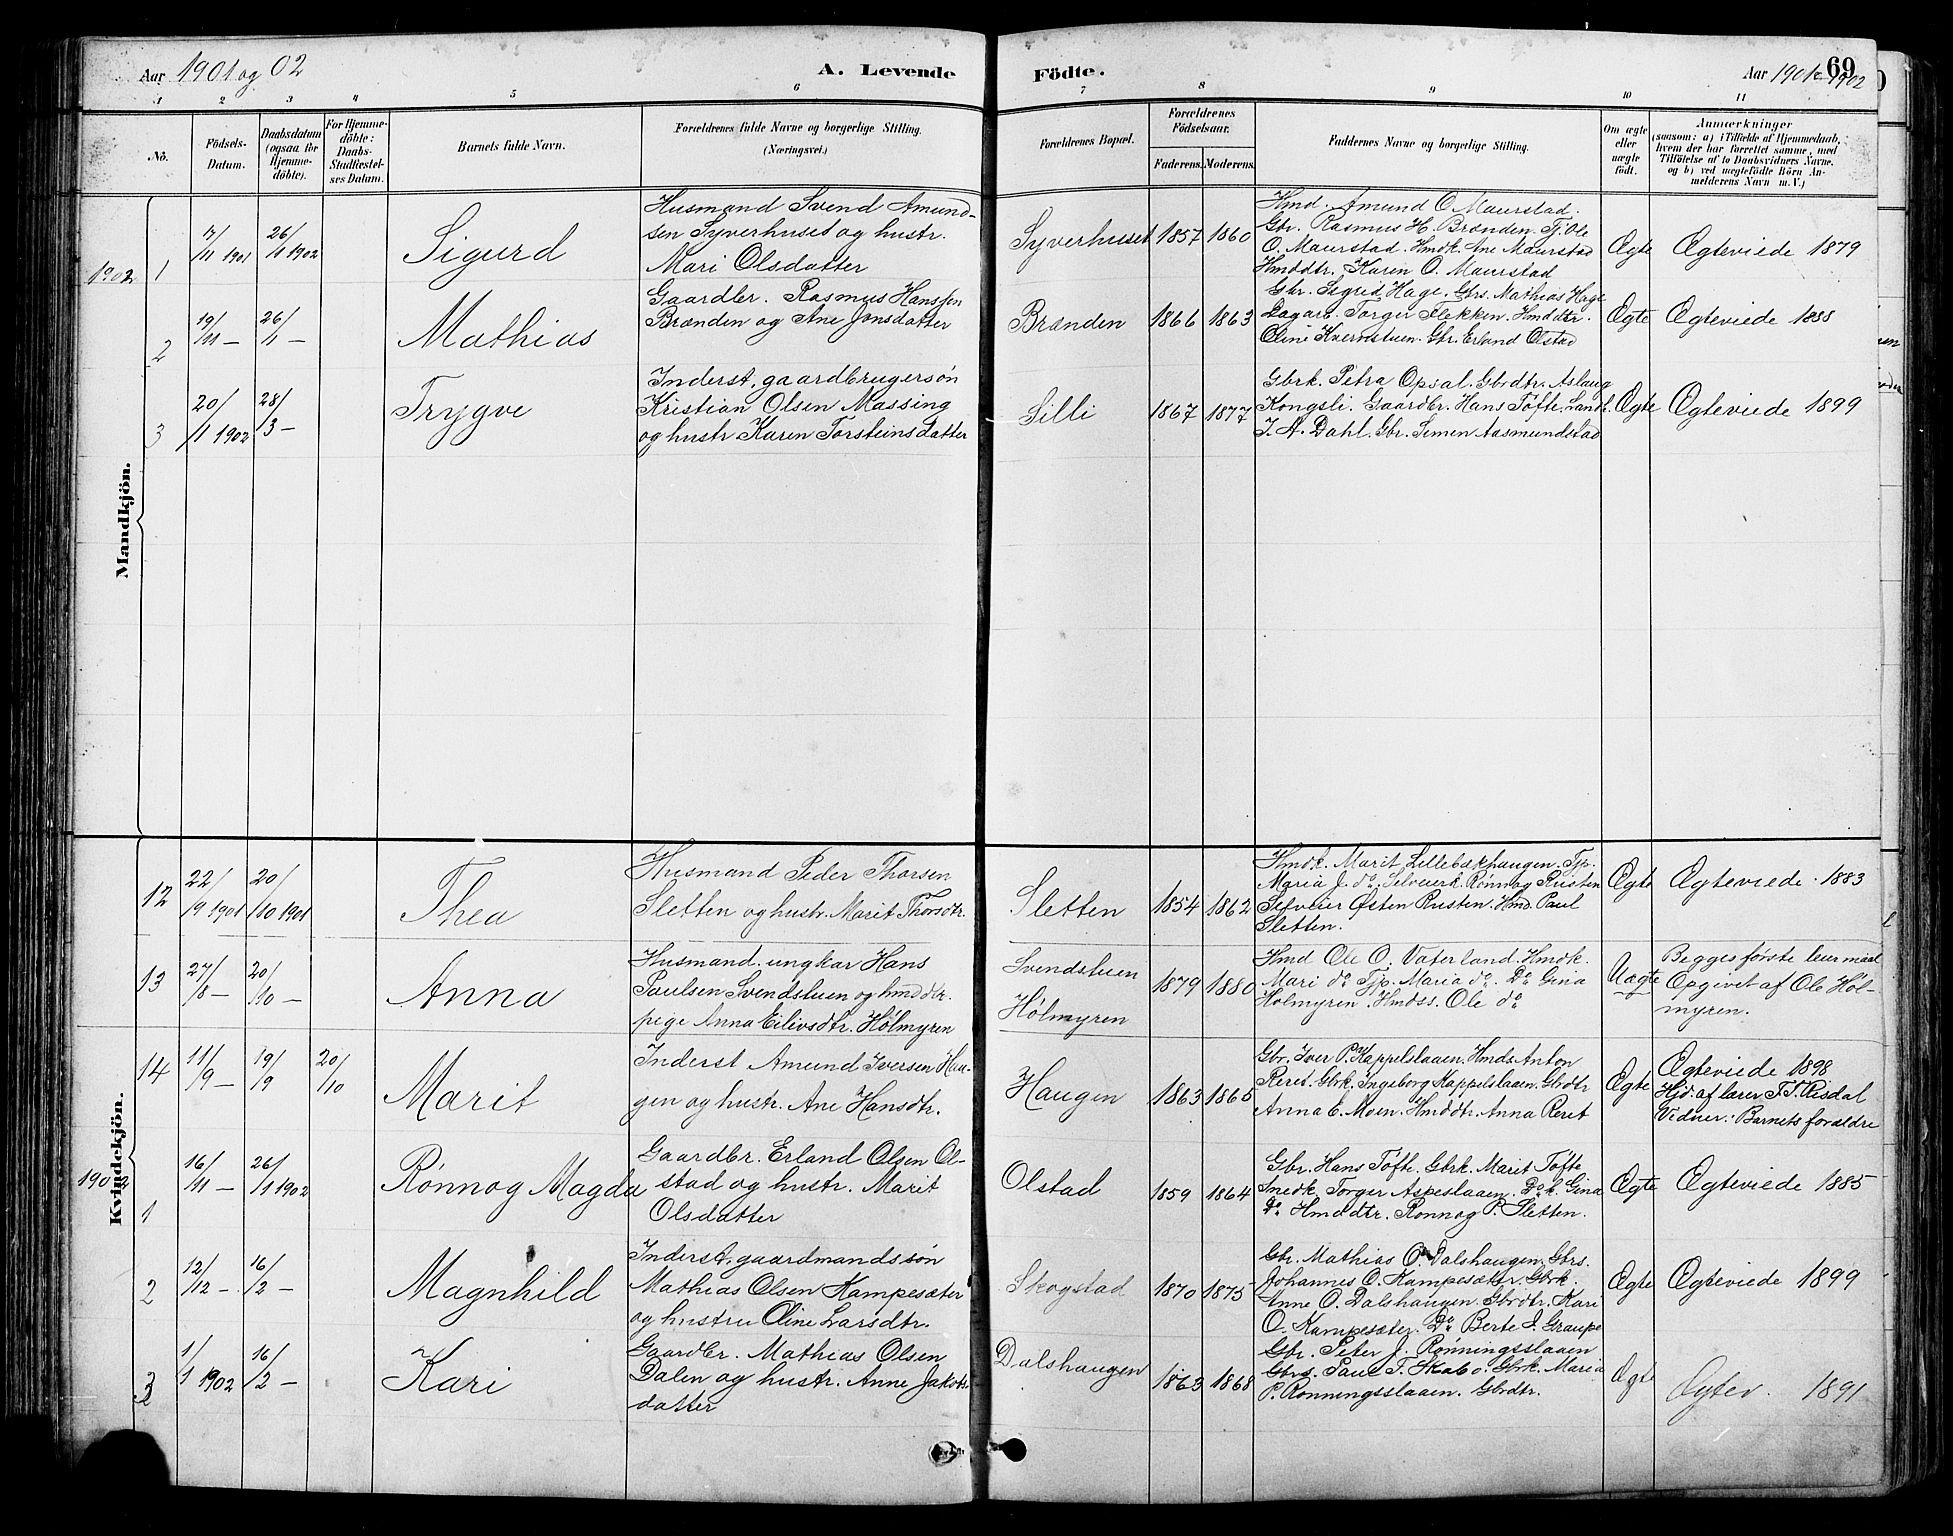 SAH, Nord-Fron prestekontor, Klokkerbok nr. 5, 1884-1914, s. 69